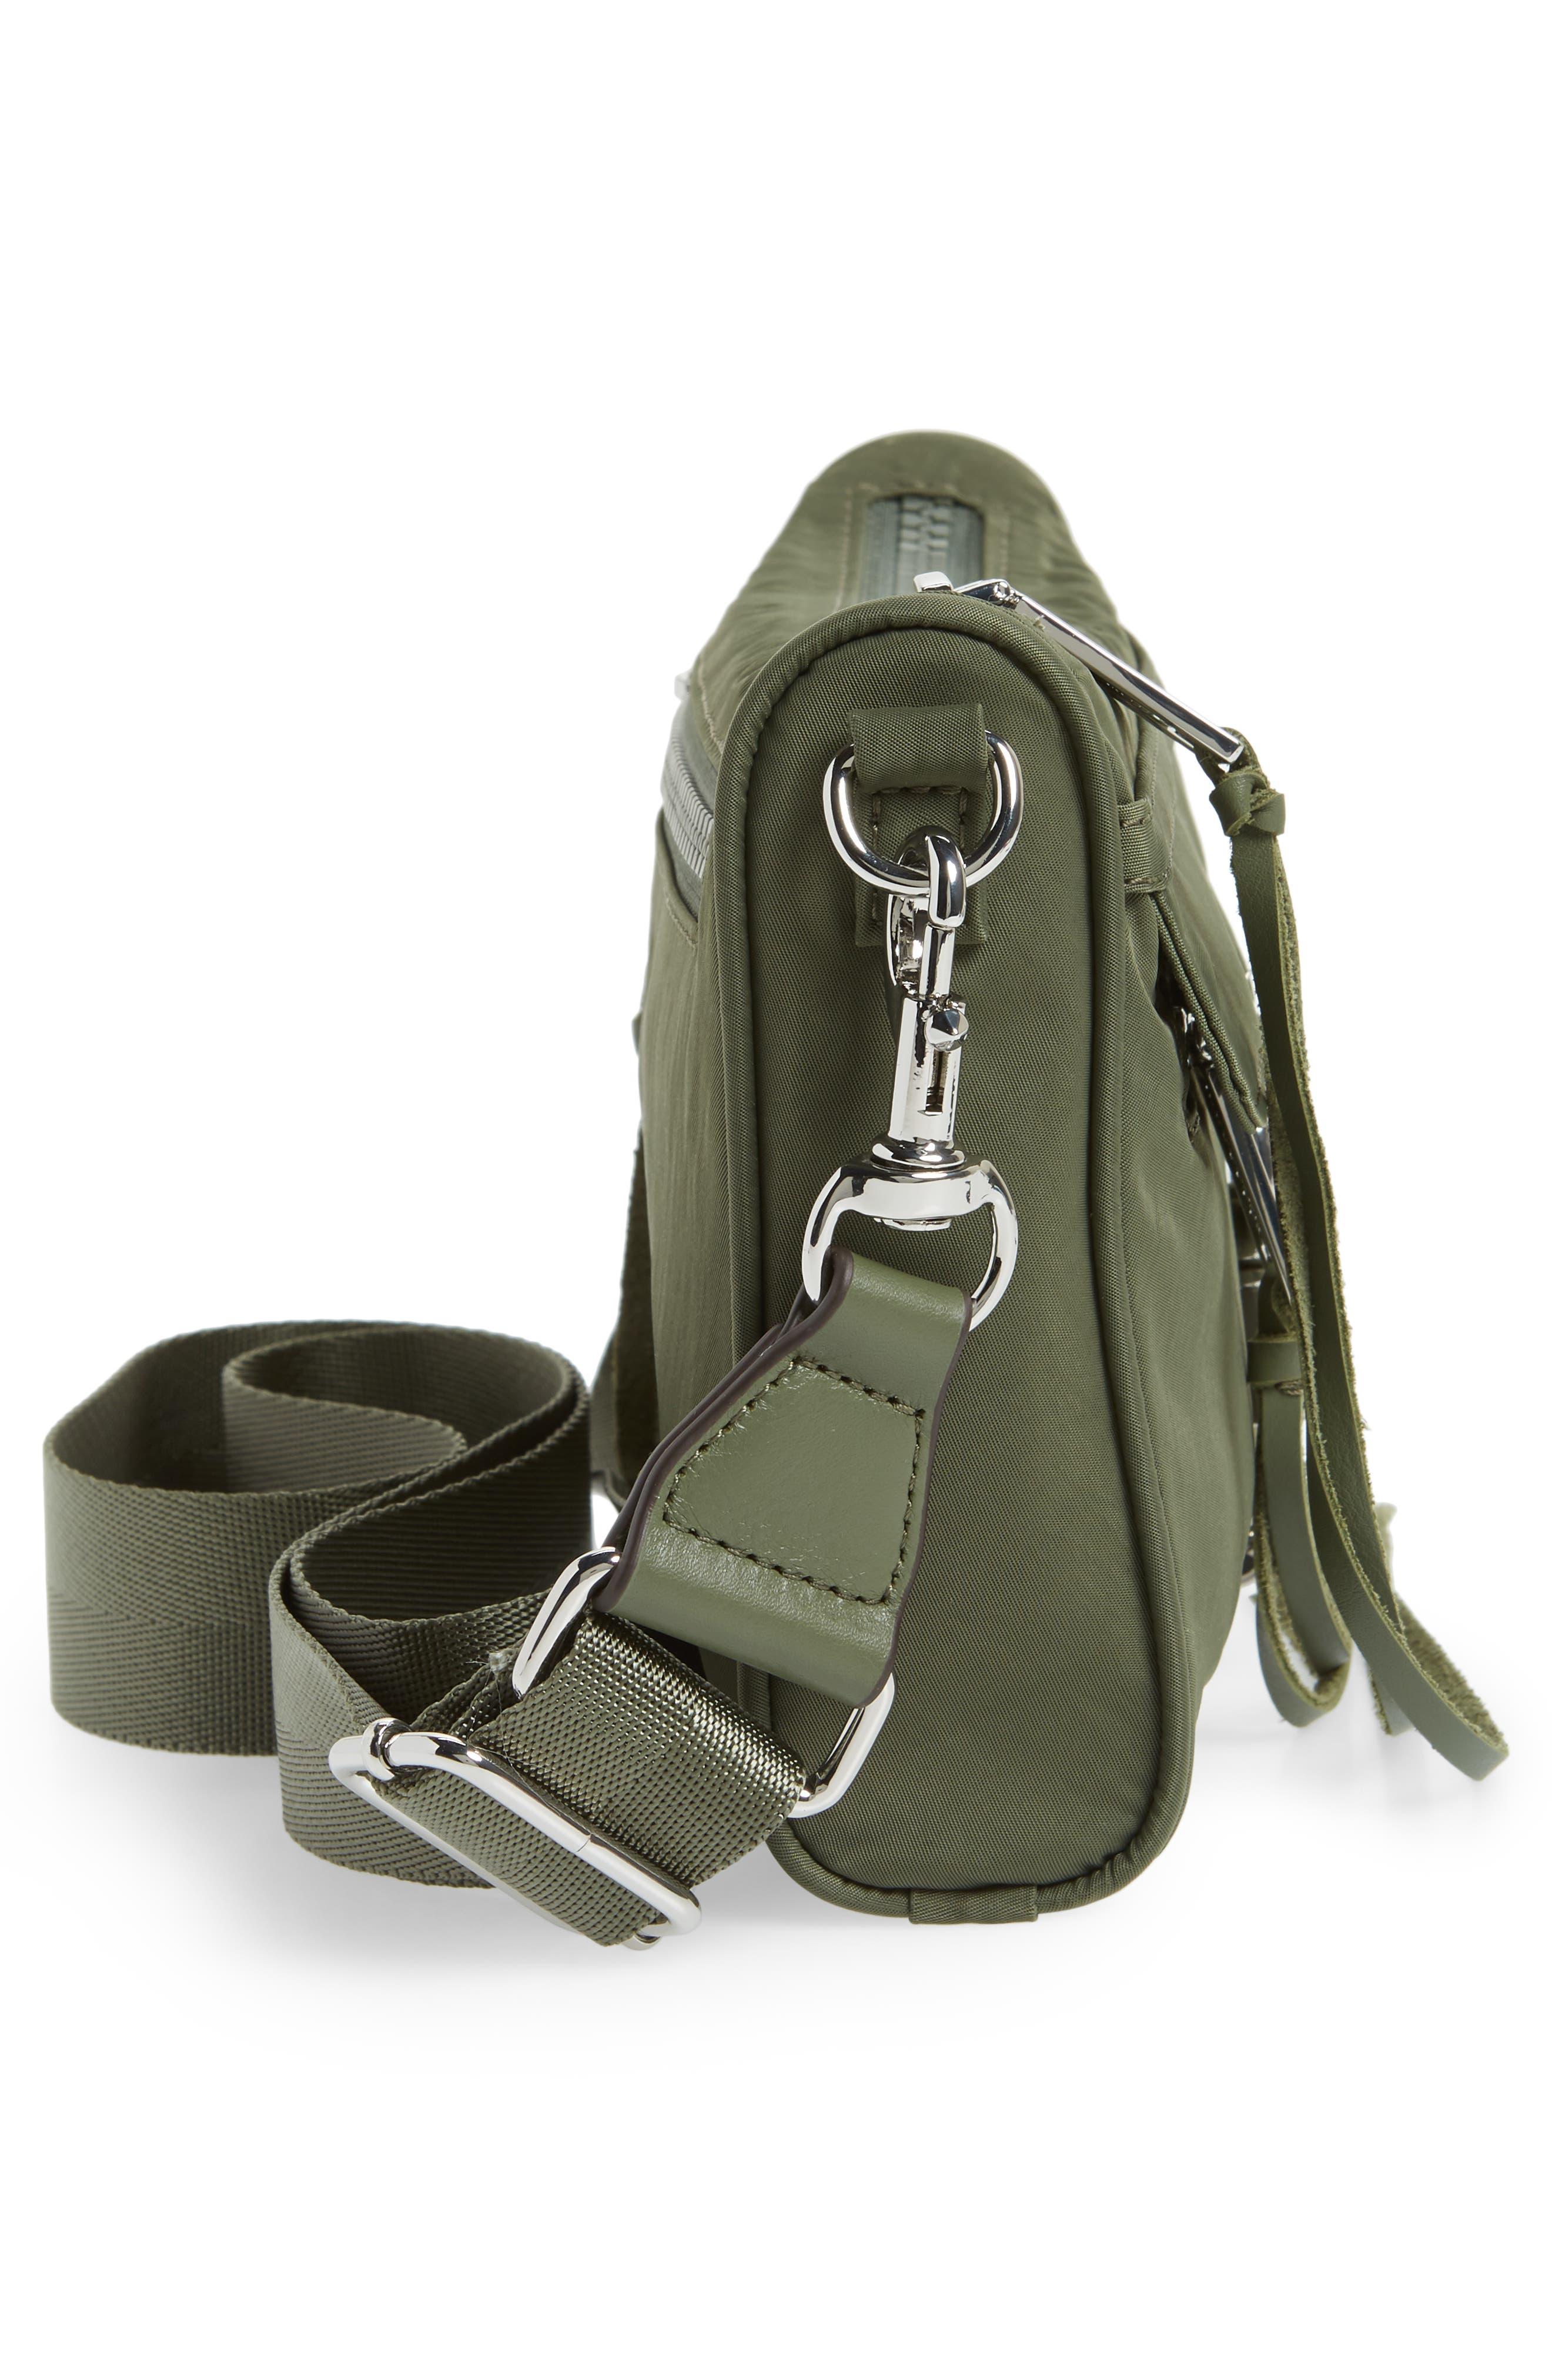 Mini Mac Convertible Crossbody Bag,                             Alternate thumbnail 4, color,                             Olive